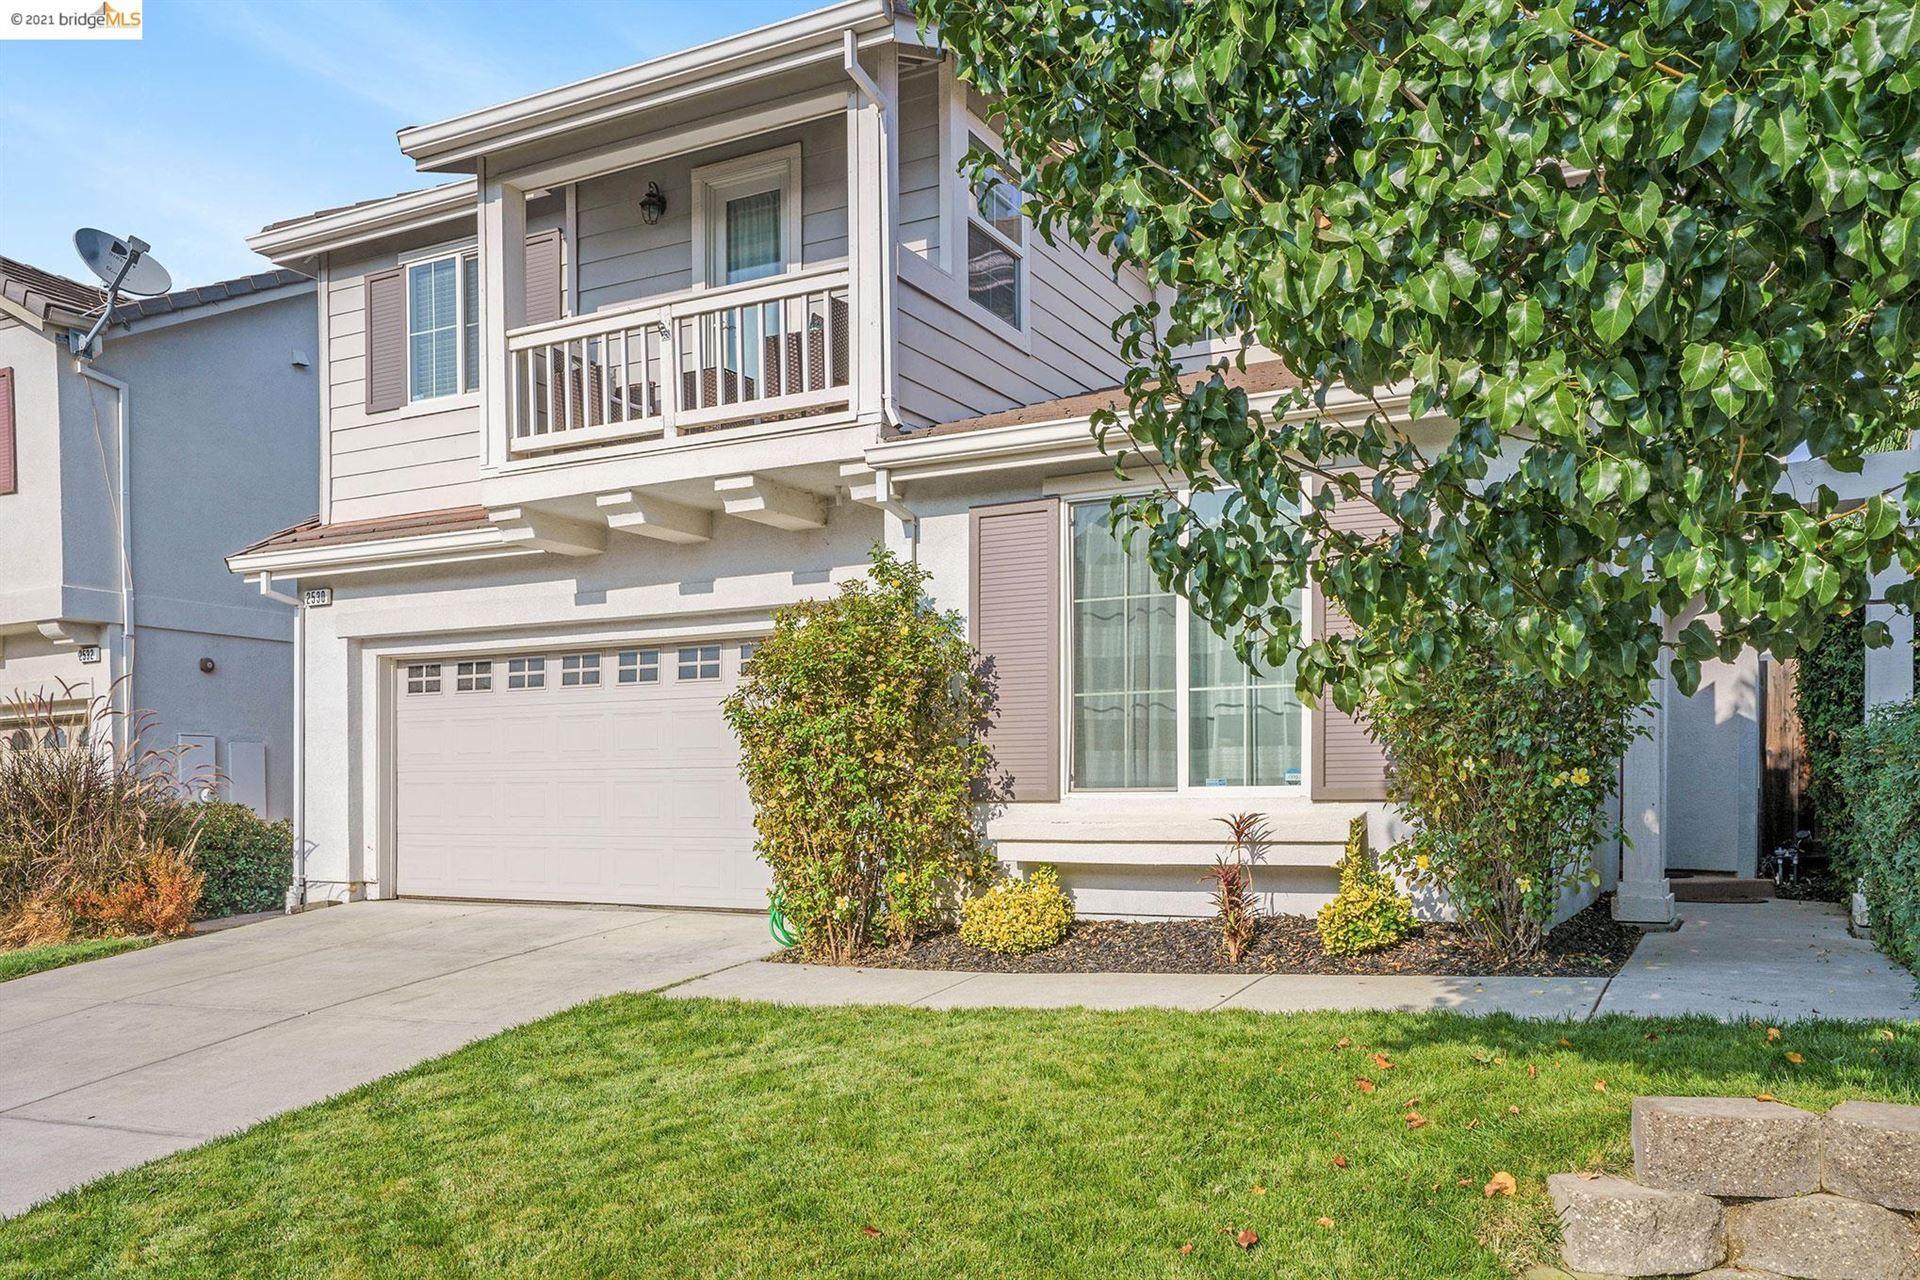 Photo of 2530 Albertine Ln, Brentwood, CA 94513 (MLS # 40969927)